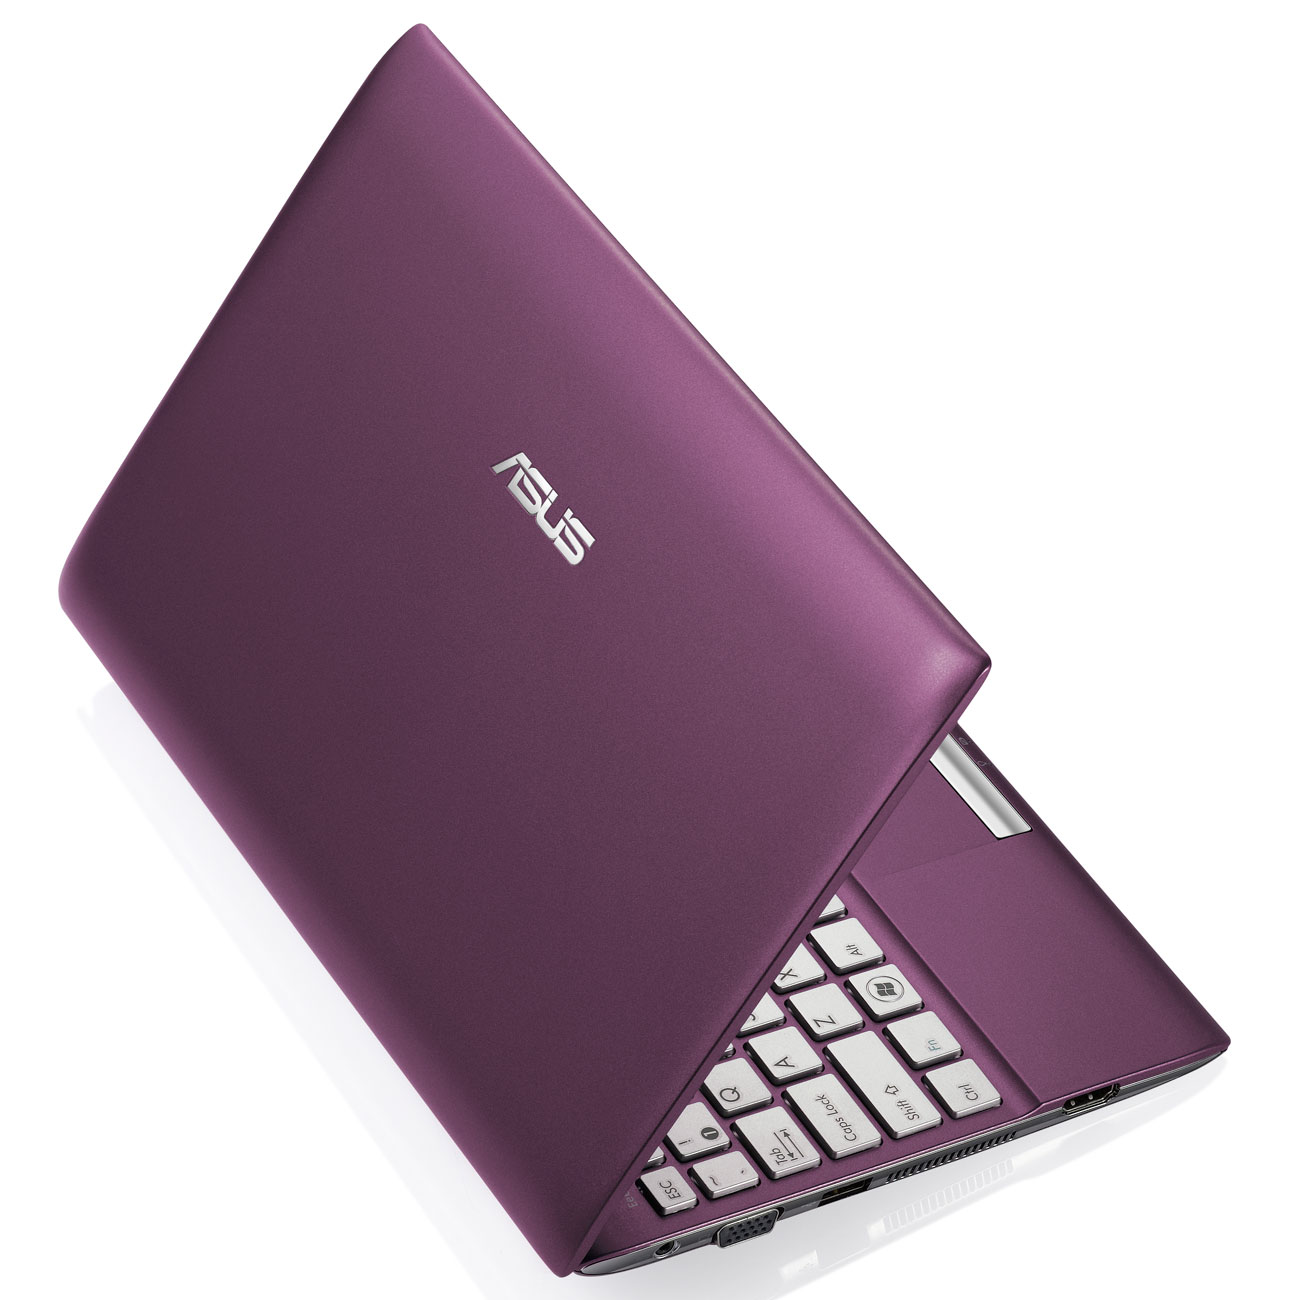 asus eee pc 1025ce pur015s violet asus sur. Black Bedroom Furniture Sets. Home Design Ideas